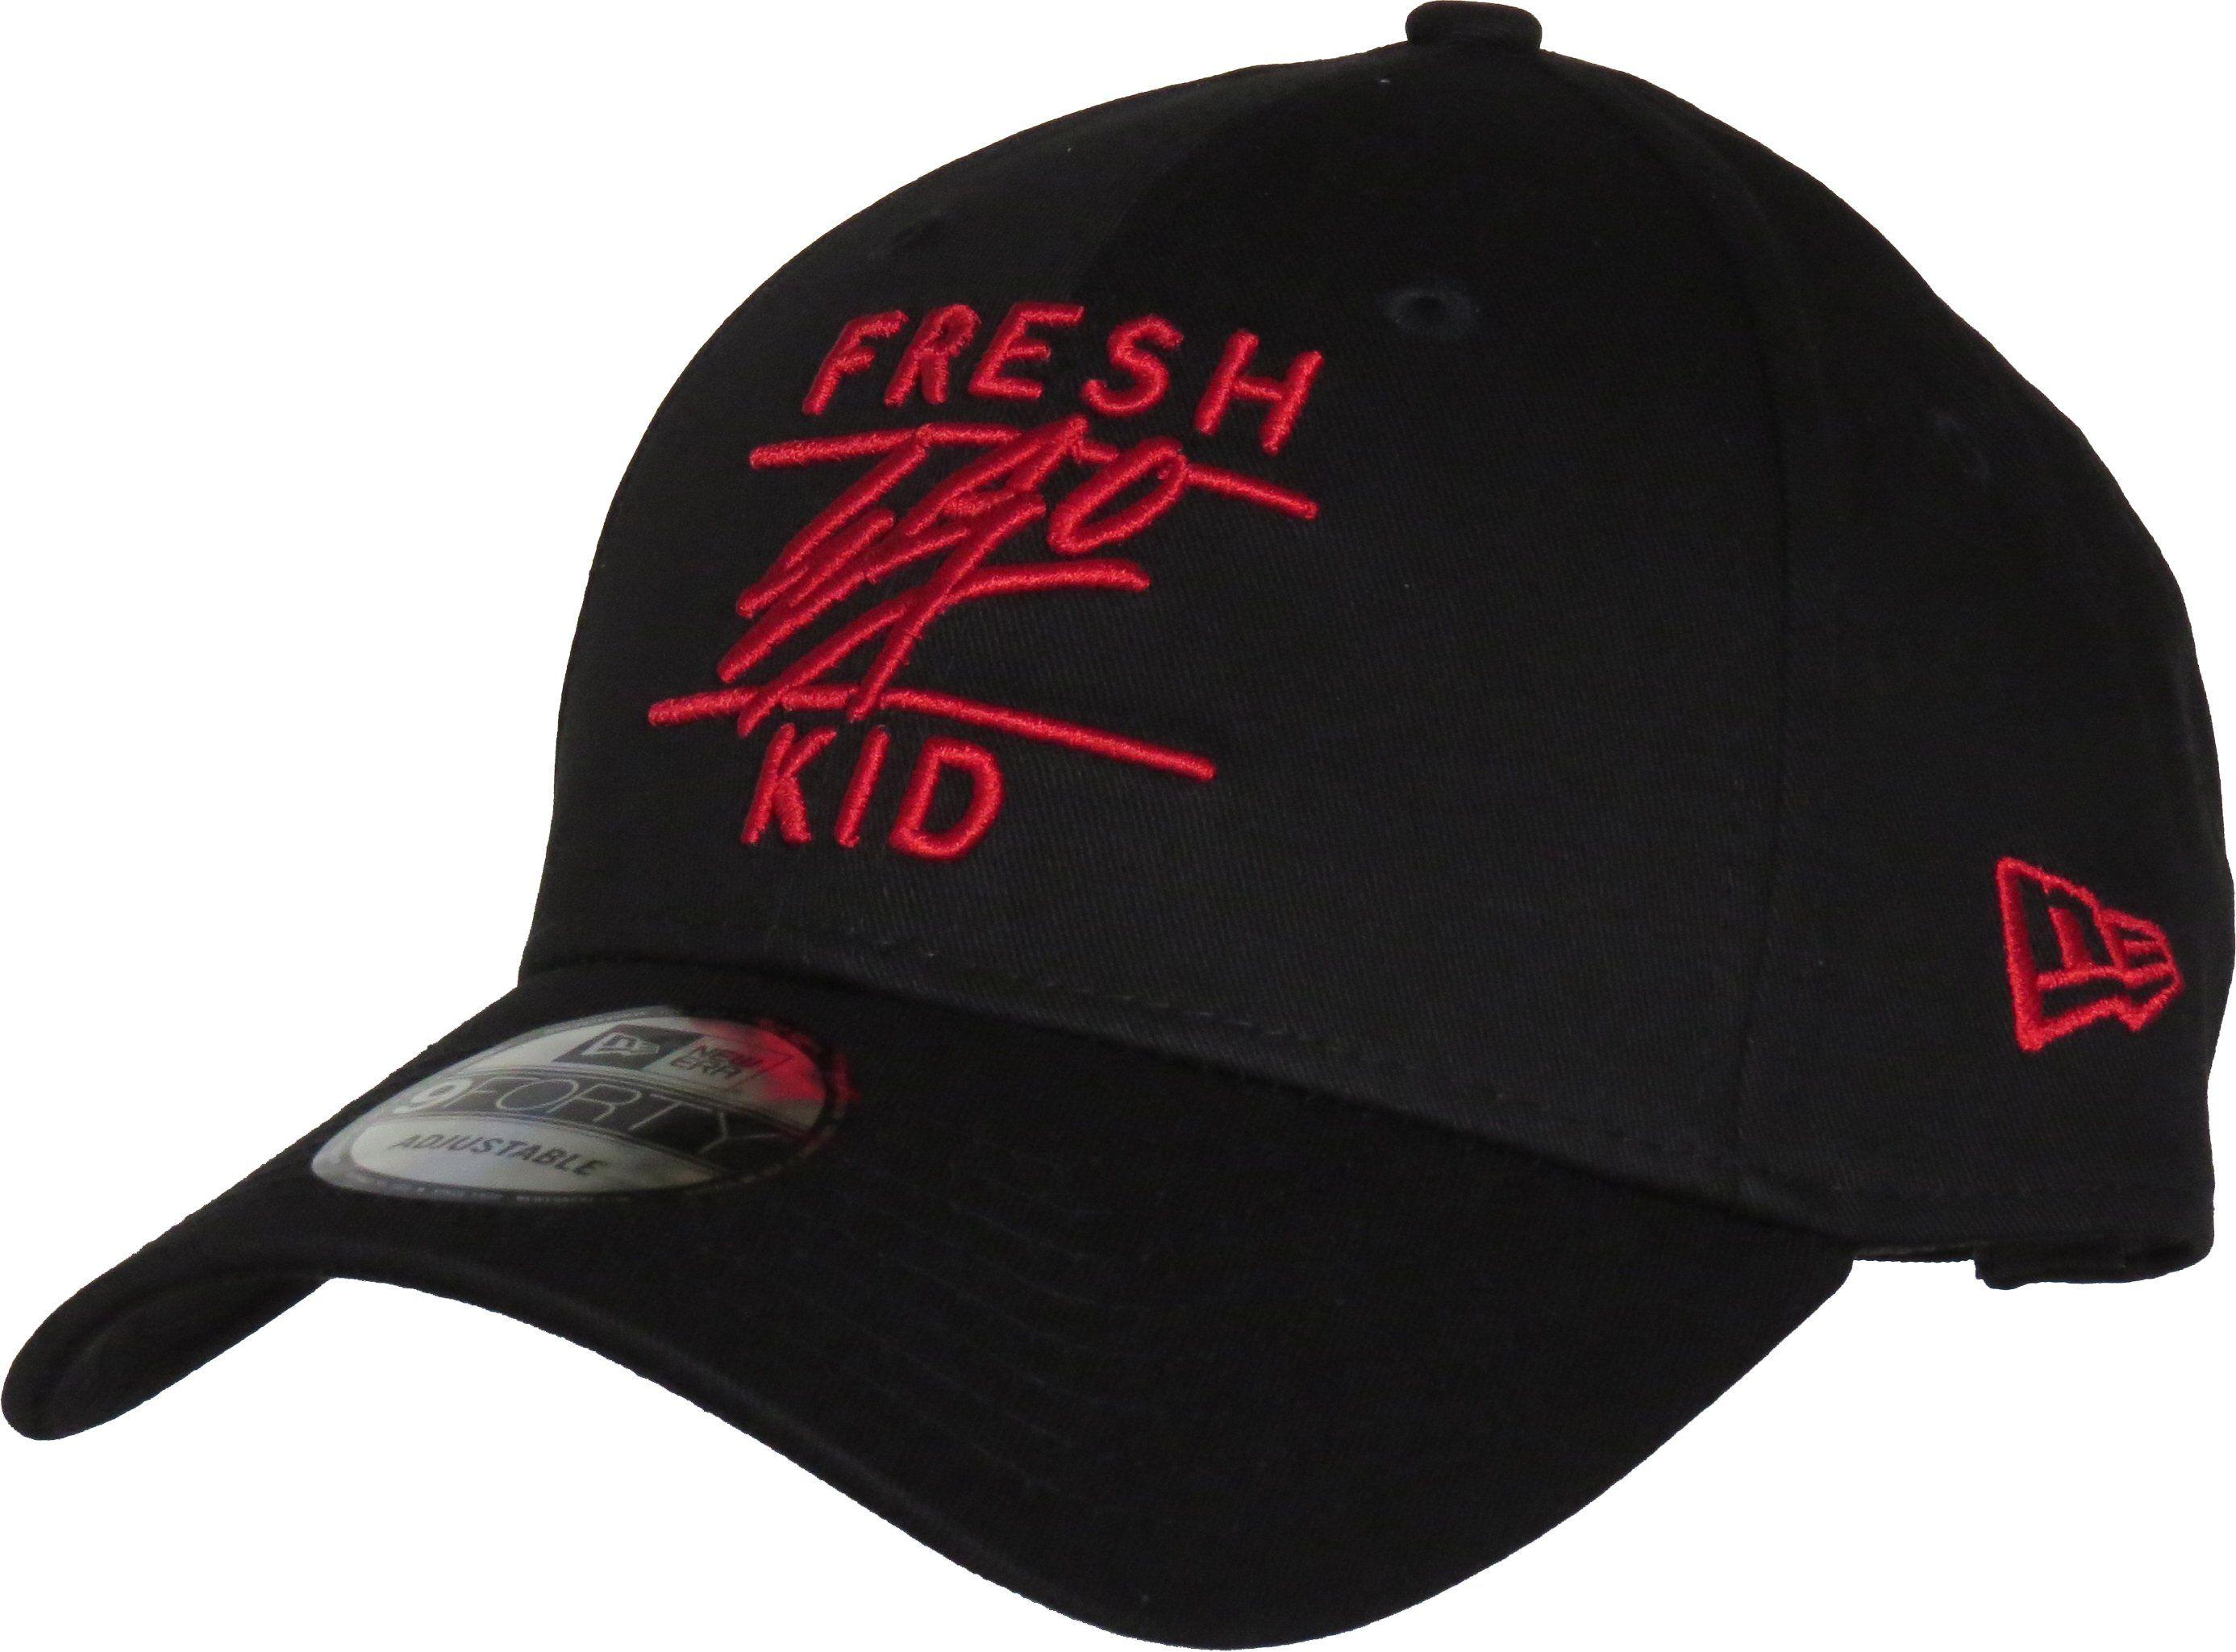 35c5a2ce Copy of Fresh Ego Kid New Era 940 Black/Red Baseball Cap – lovemycap